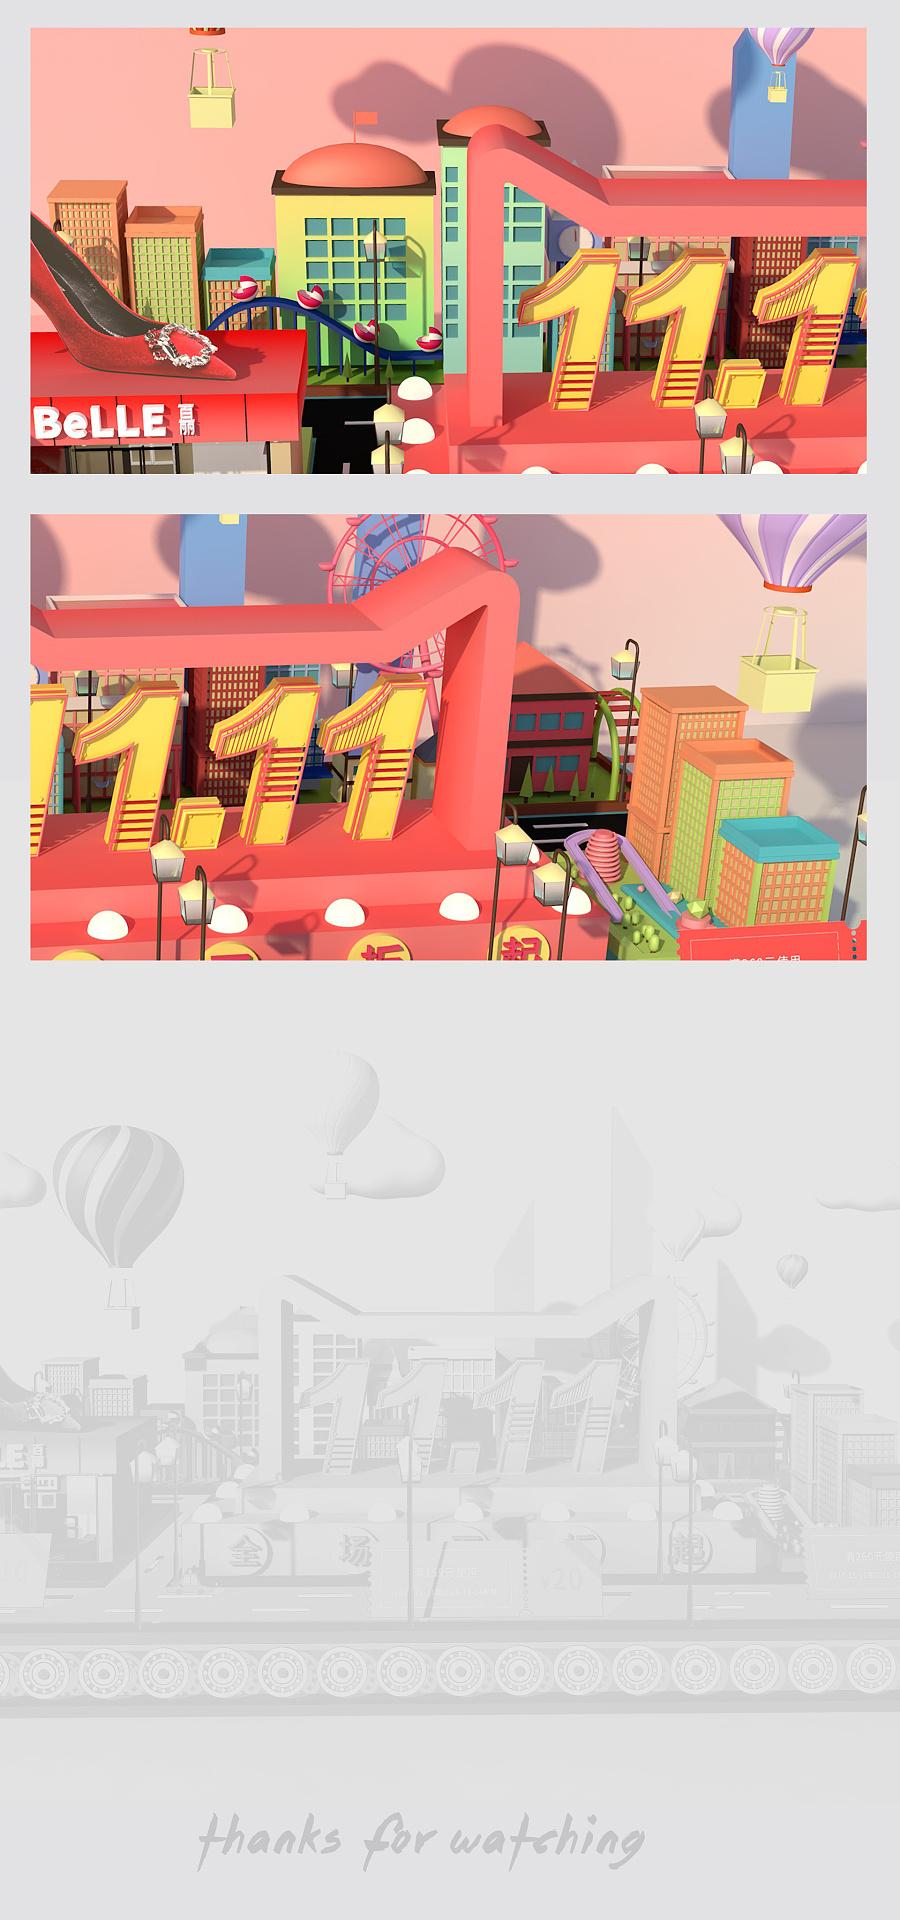 c4d城市建模 双十一海报 女鞋双十一3d风格海报图片